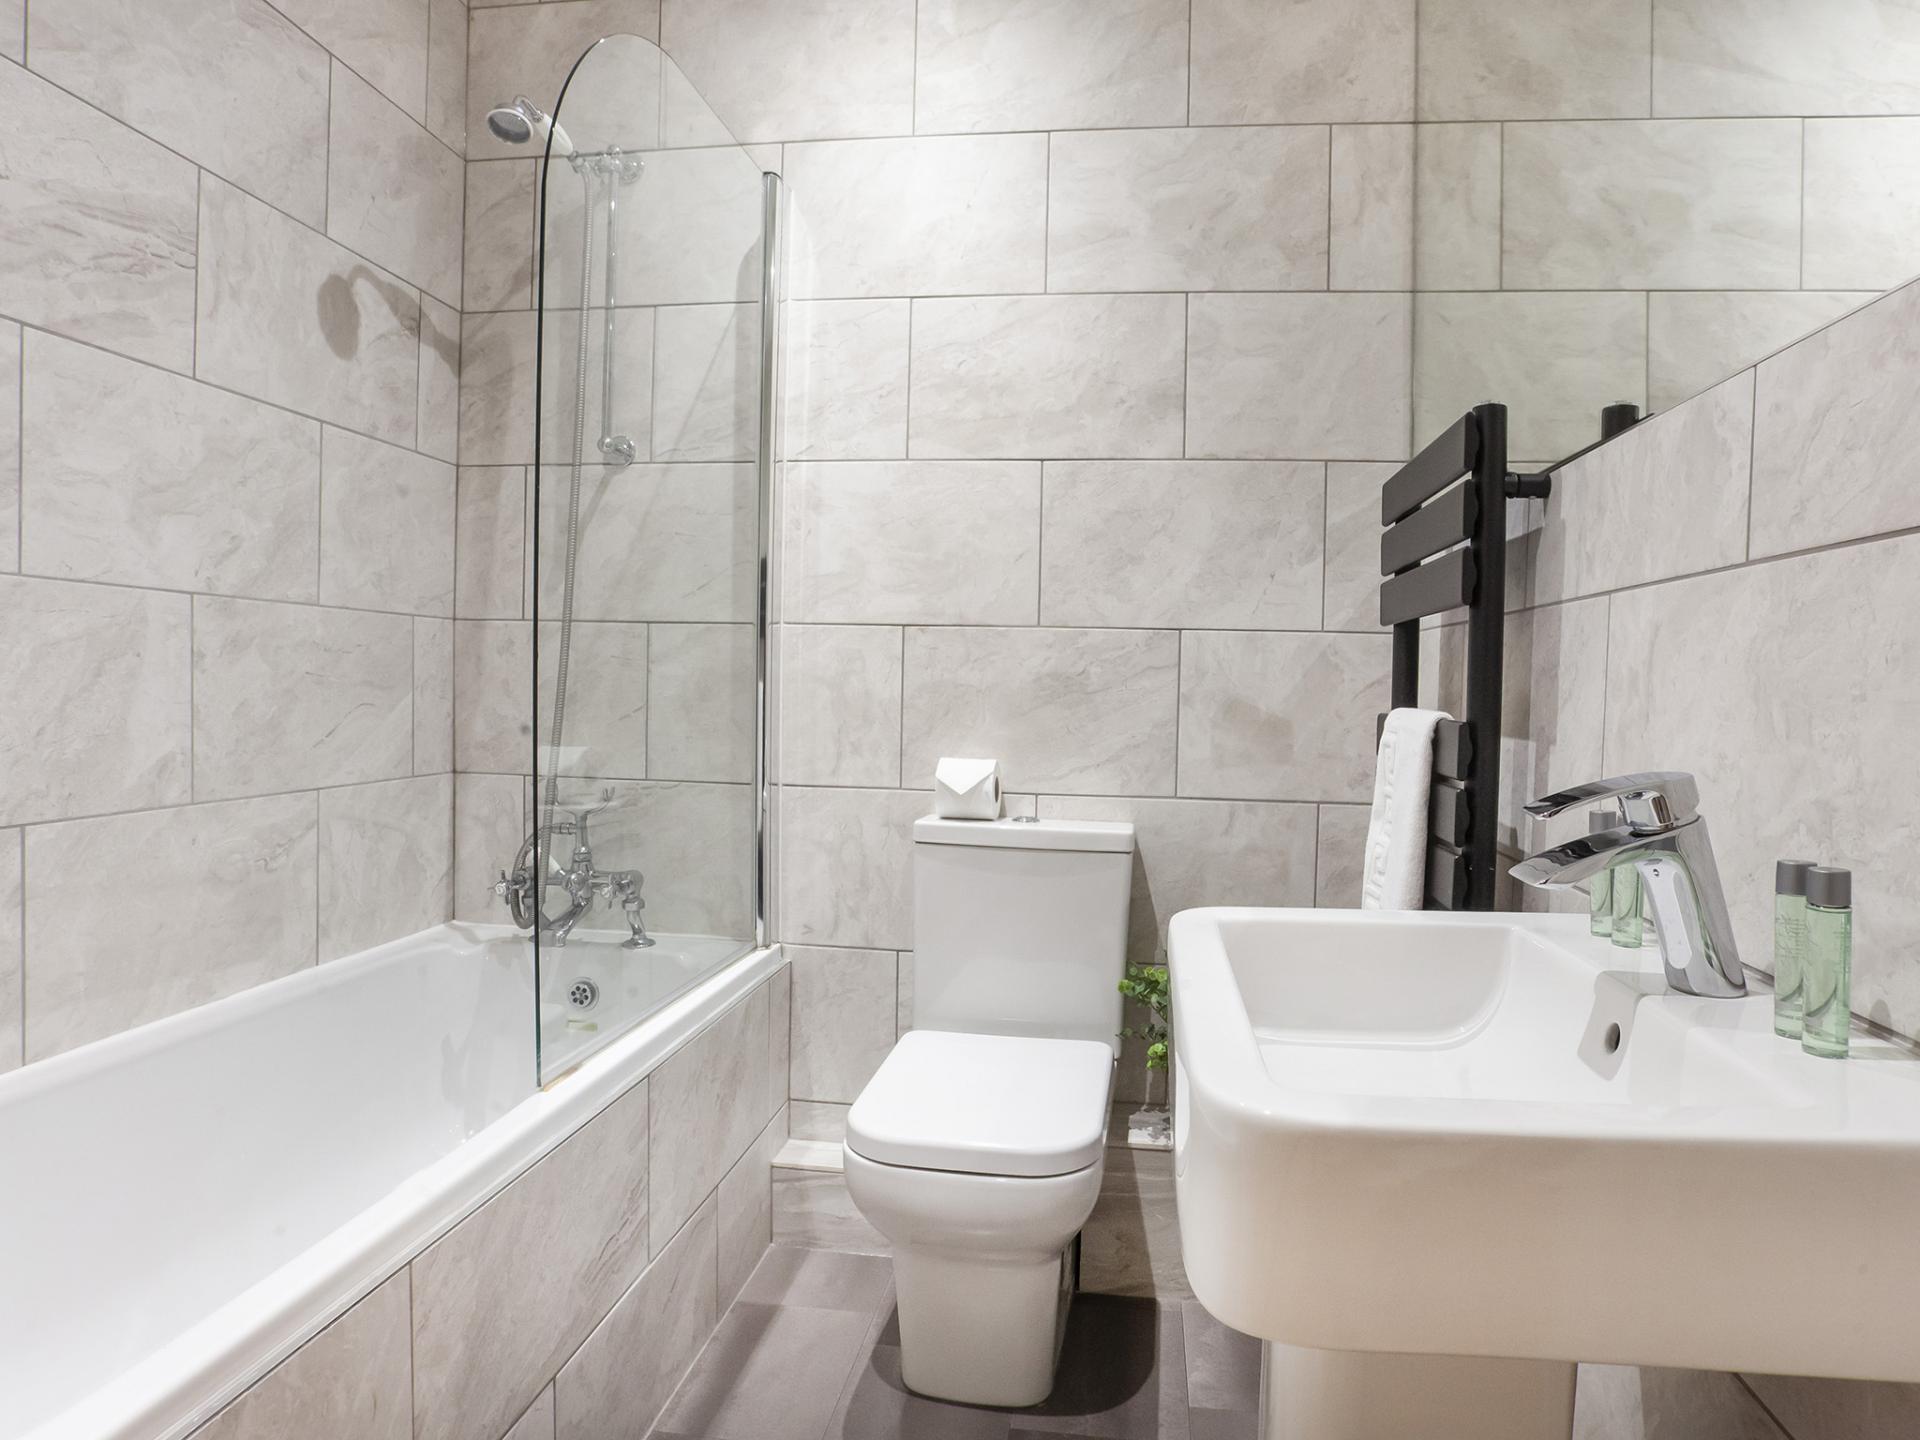 Modern Grey Bathroom The Station apartment, Centre, York - Citybase Apartments